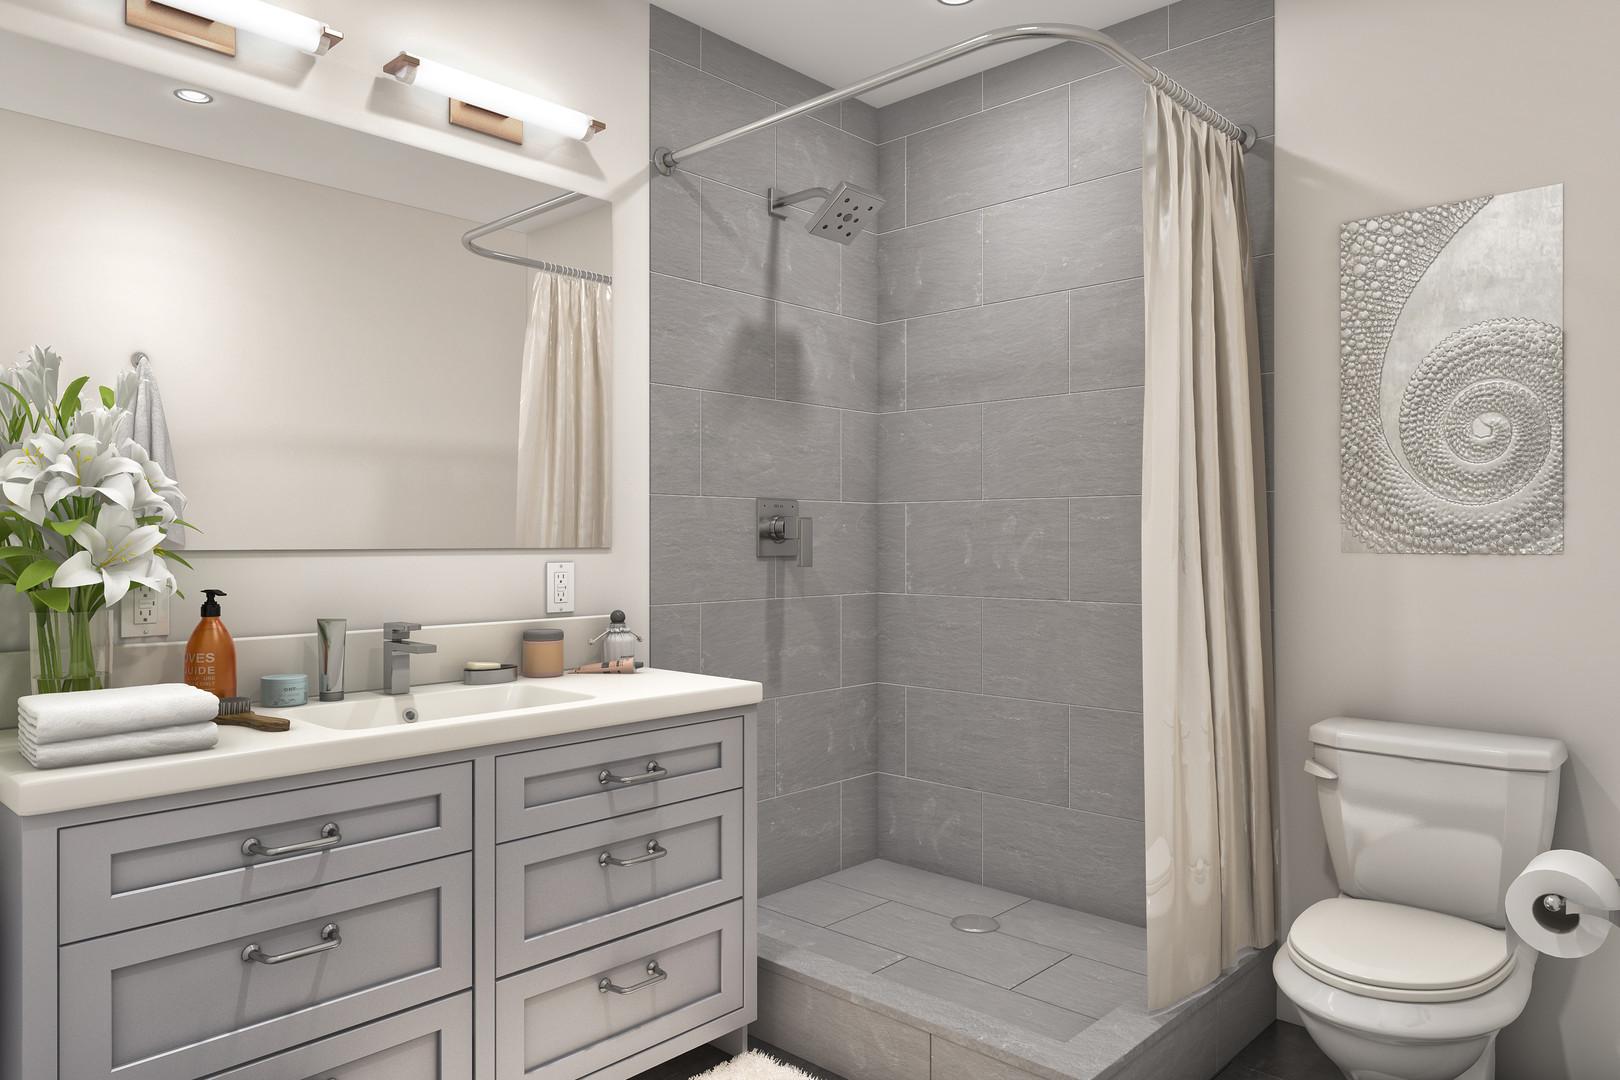 Skyline Model Bathroom*